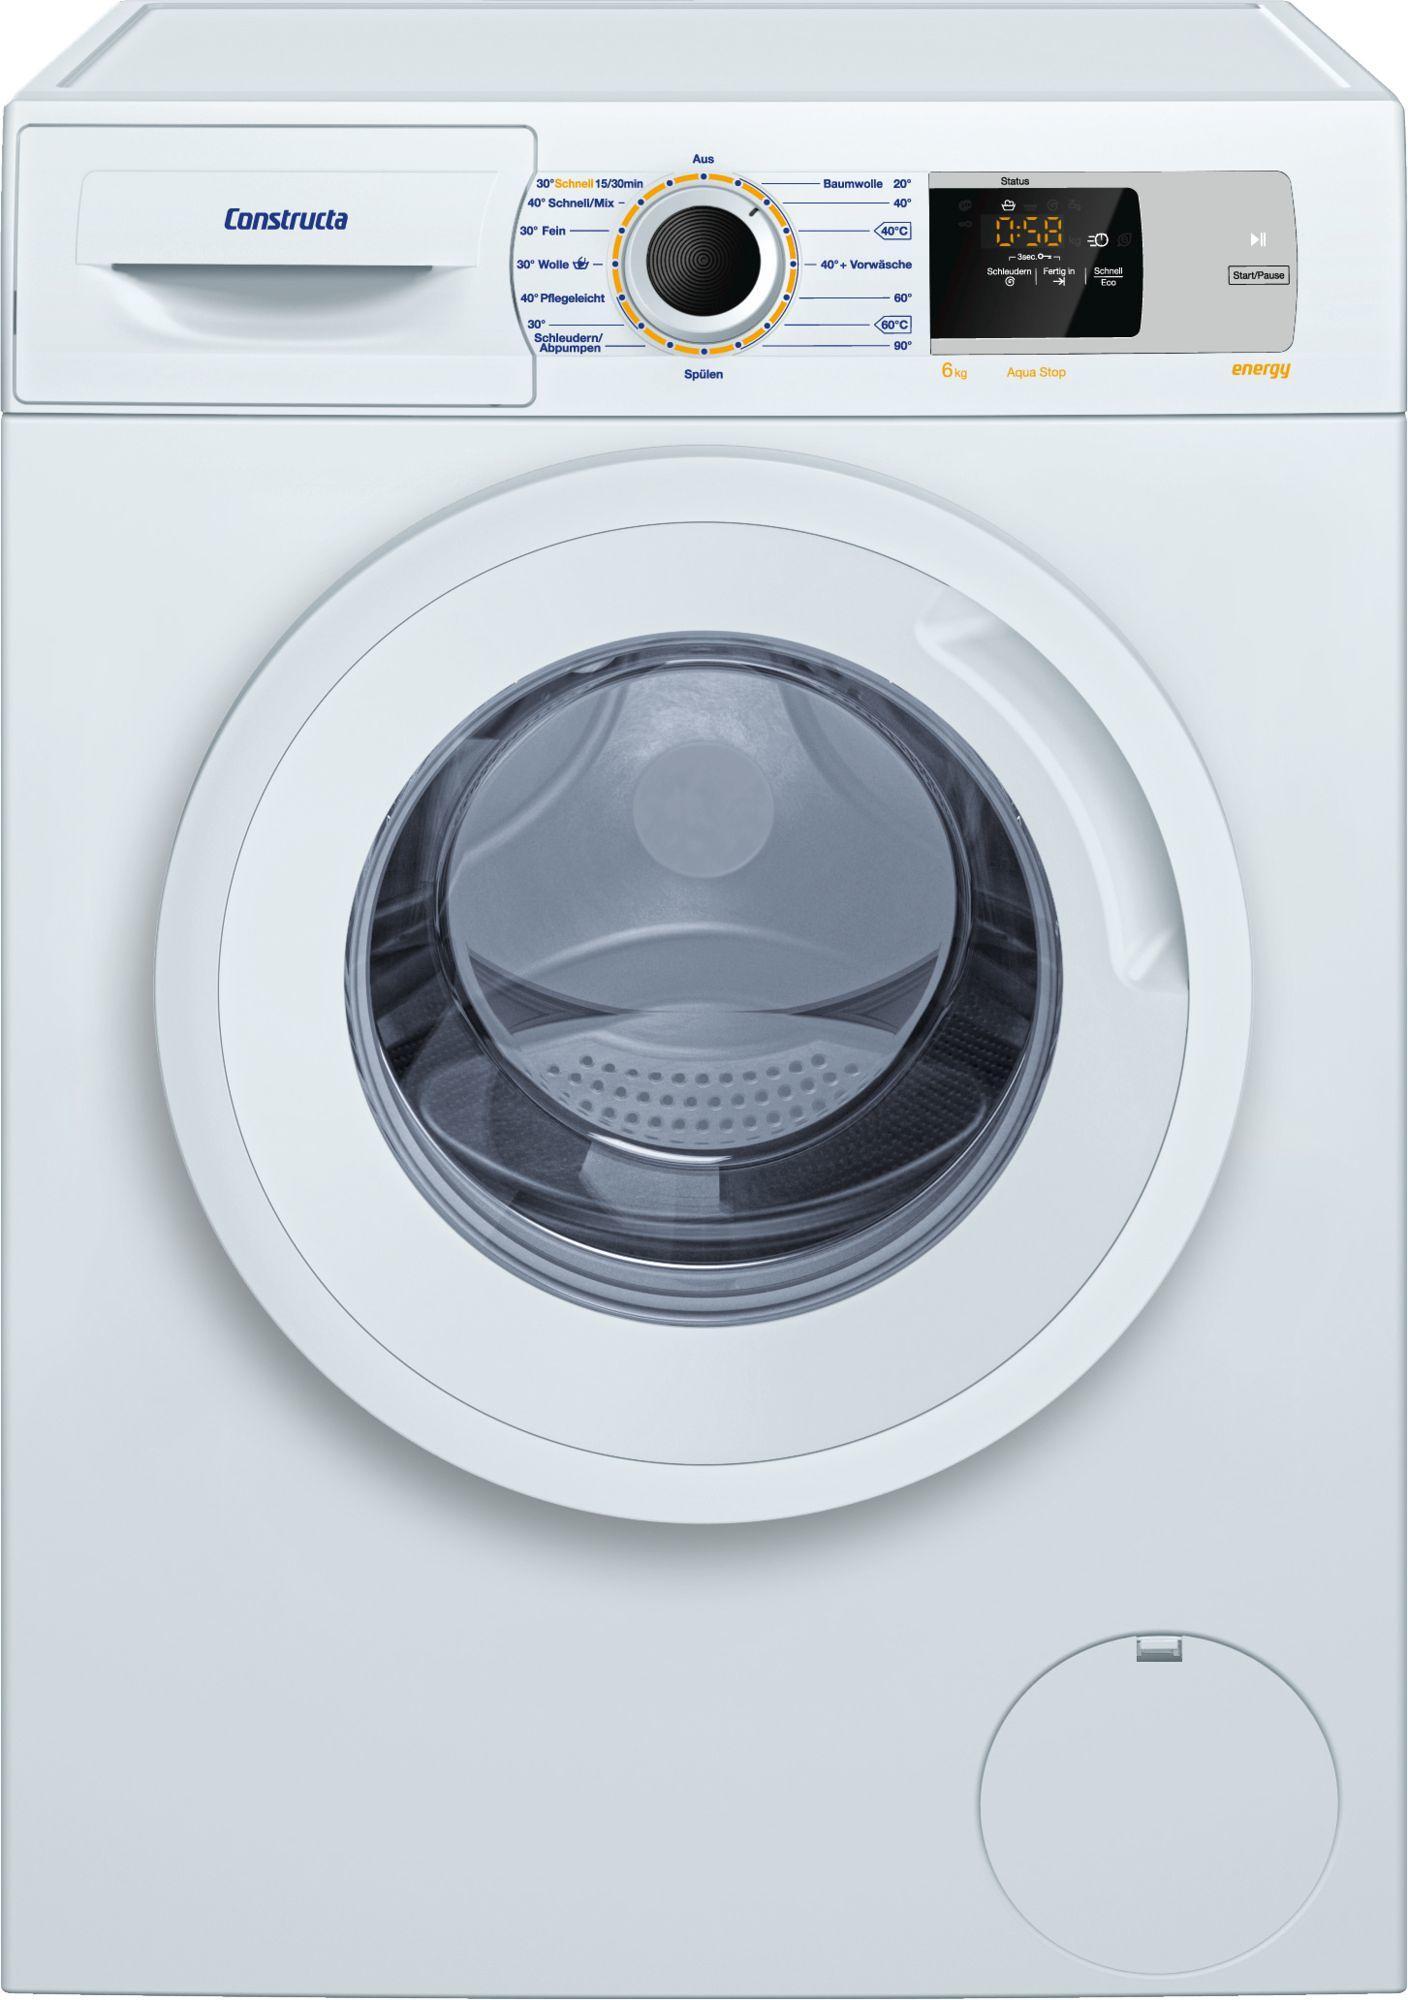 constructa cwf14n00 6kg a waschvollautomat 60 cm breit. Black Bedroom Furniture Sets. Home Design Ideas